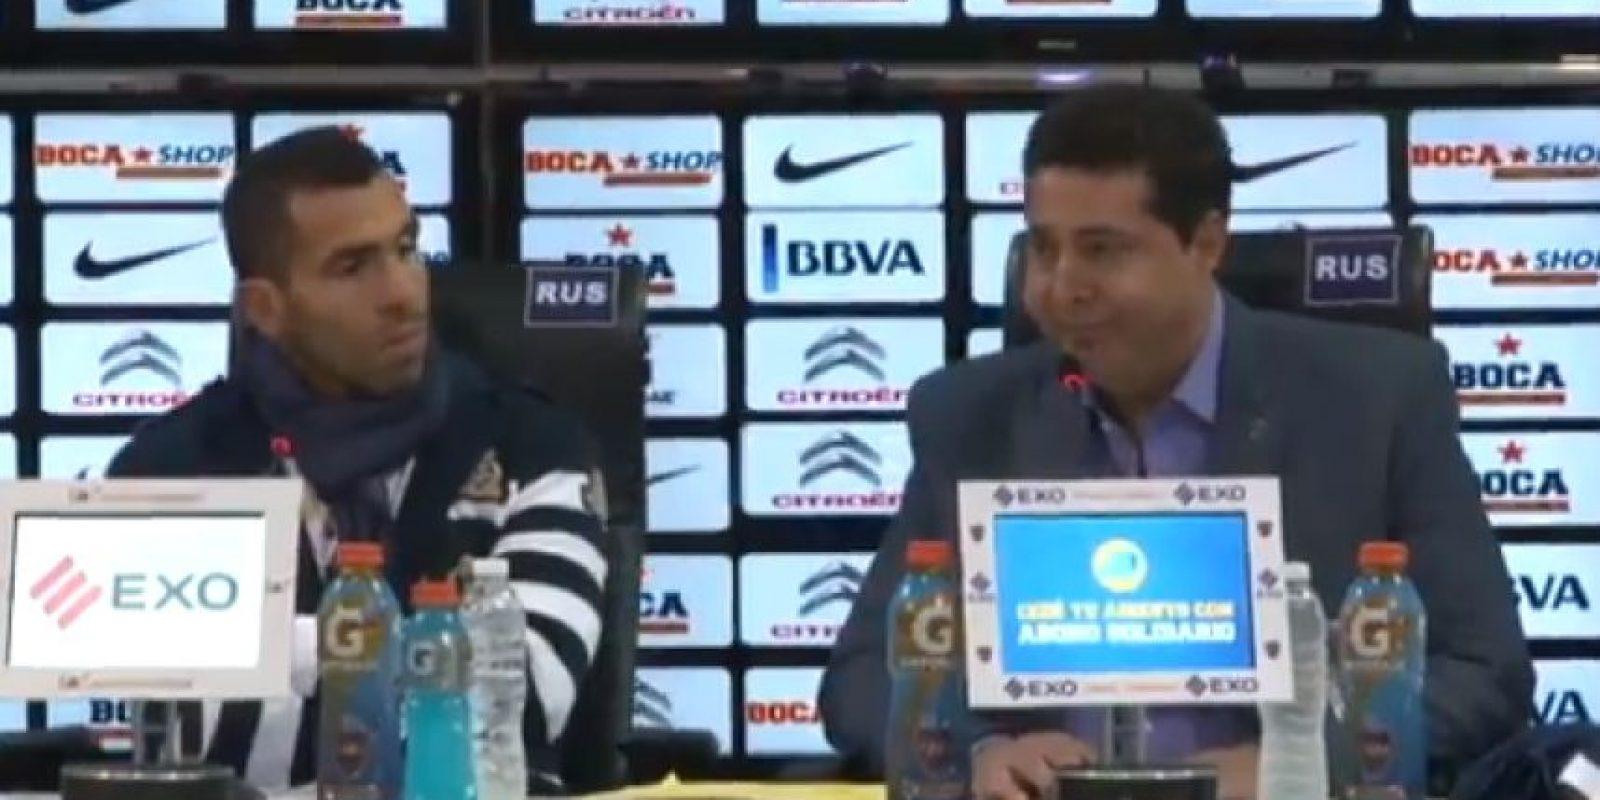 Foto:Club Atlético Boca Juniors